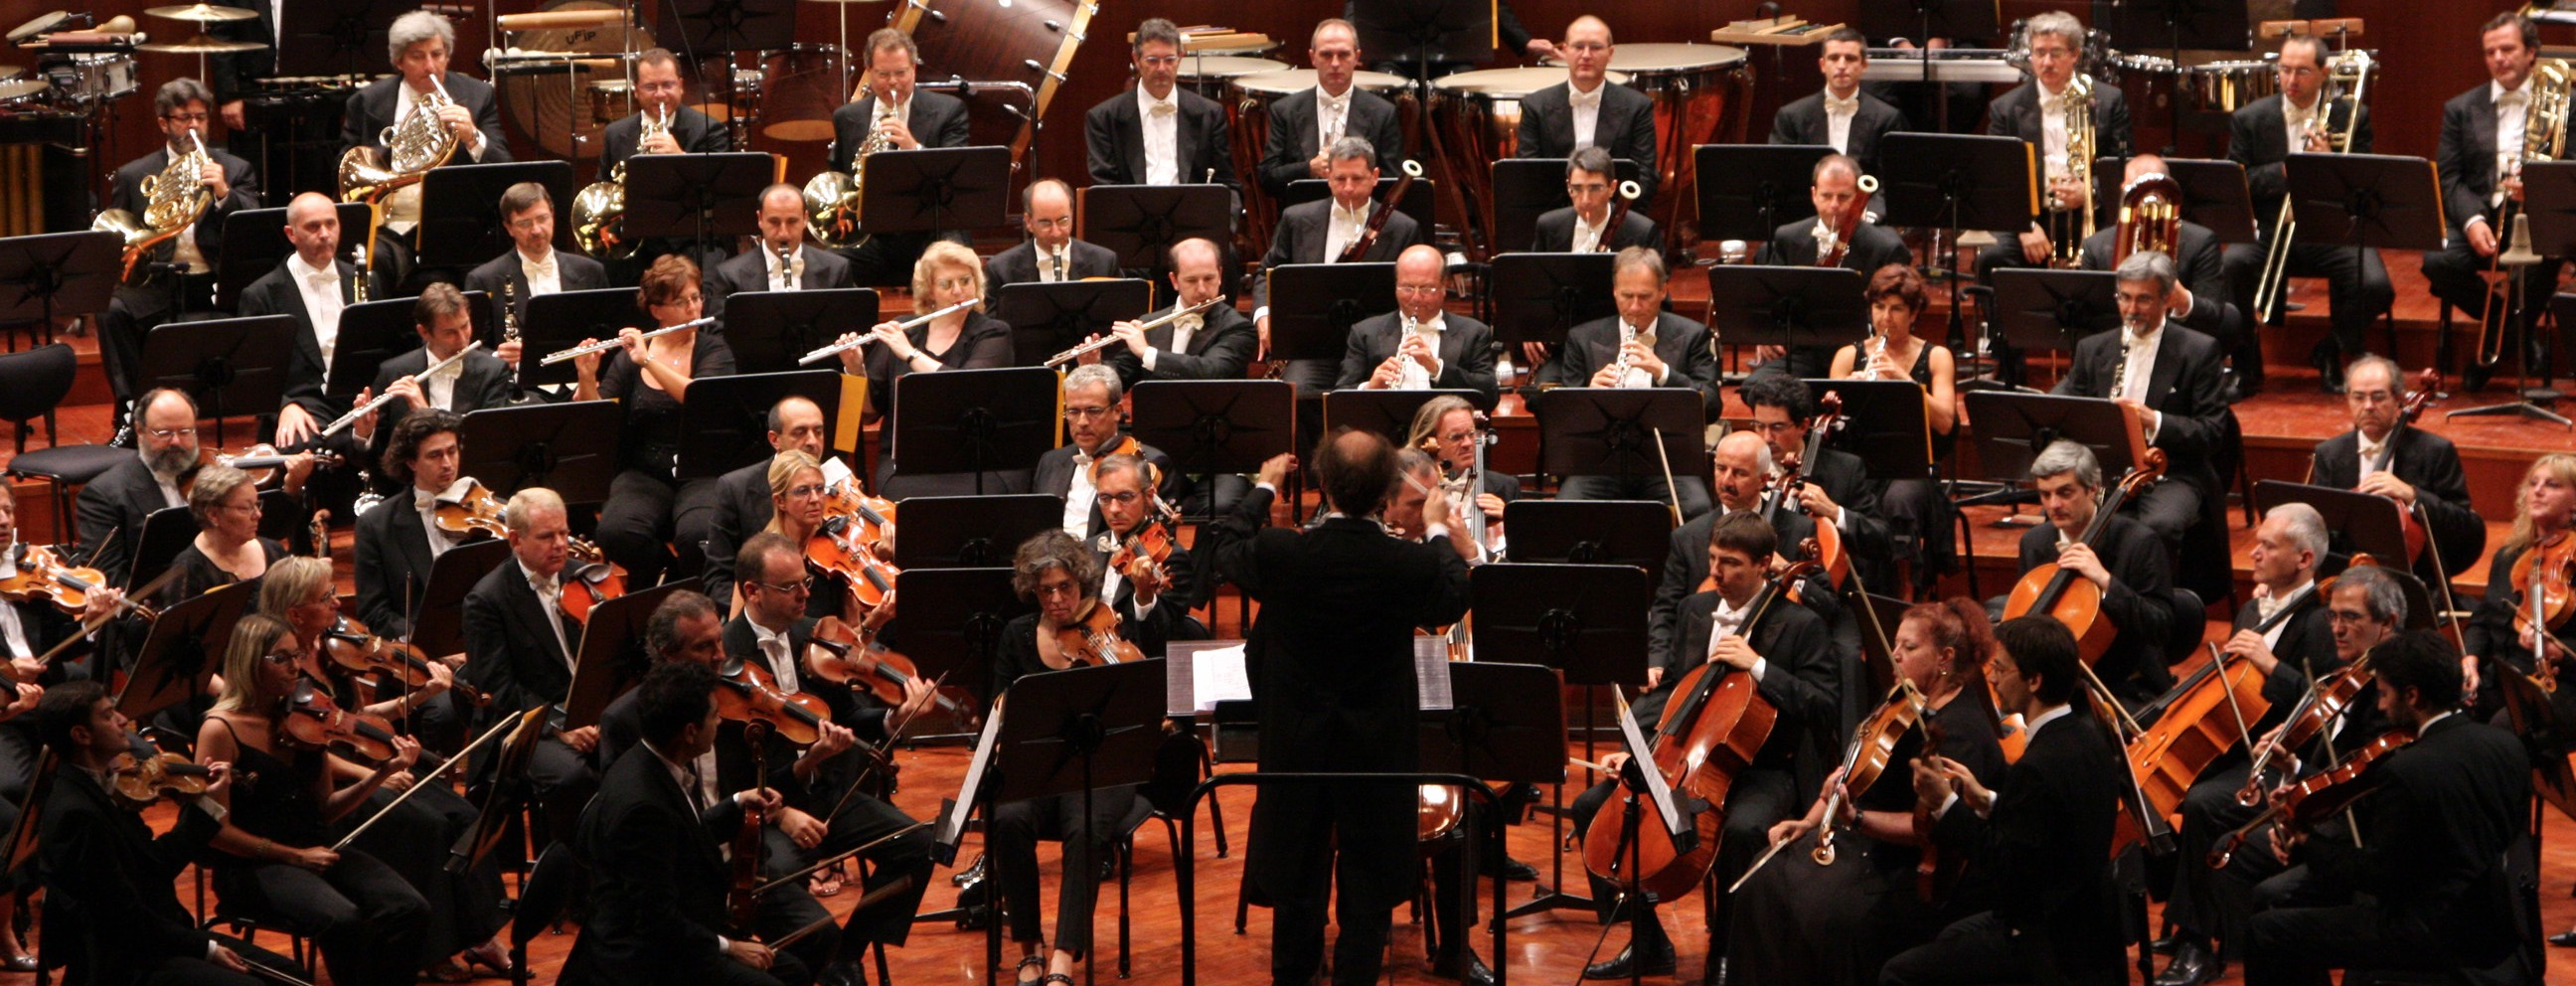 Classical Music 70 Bpm